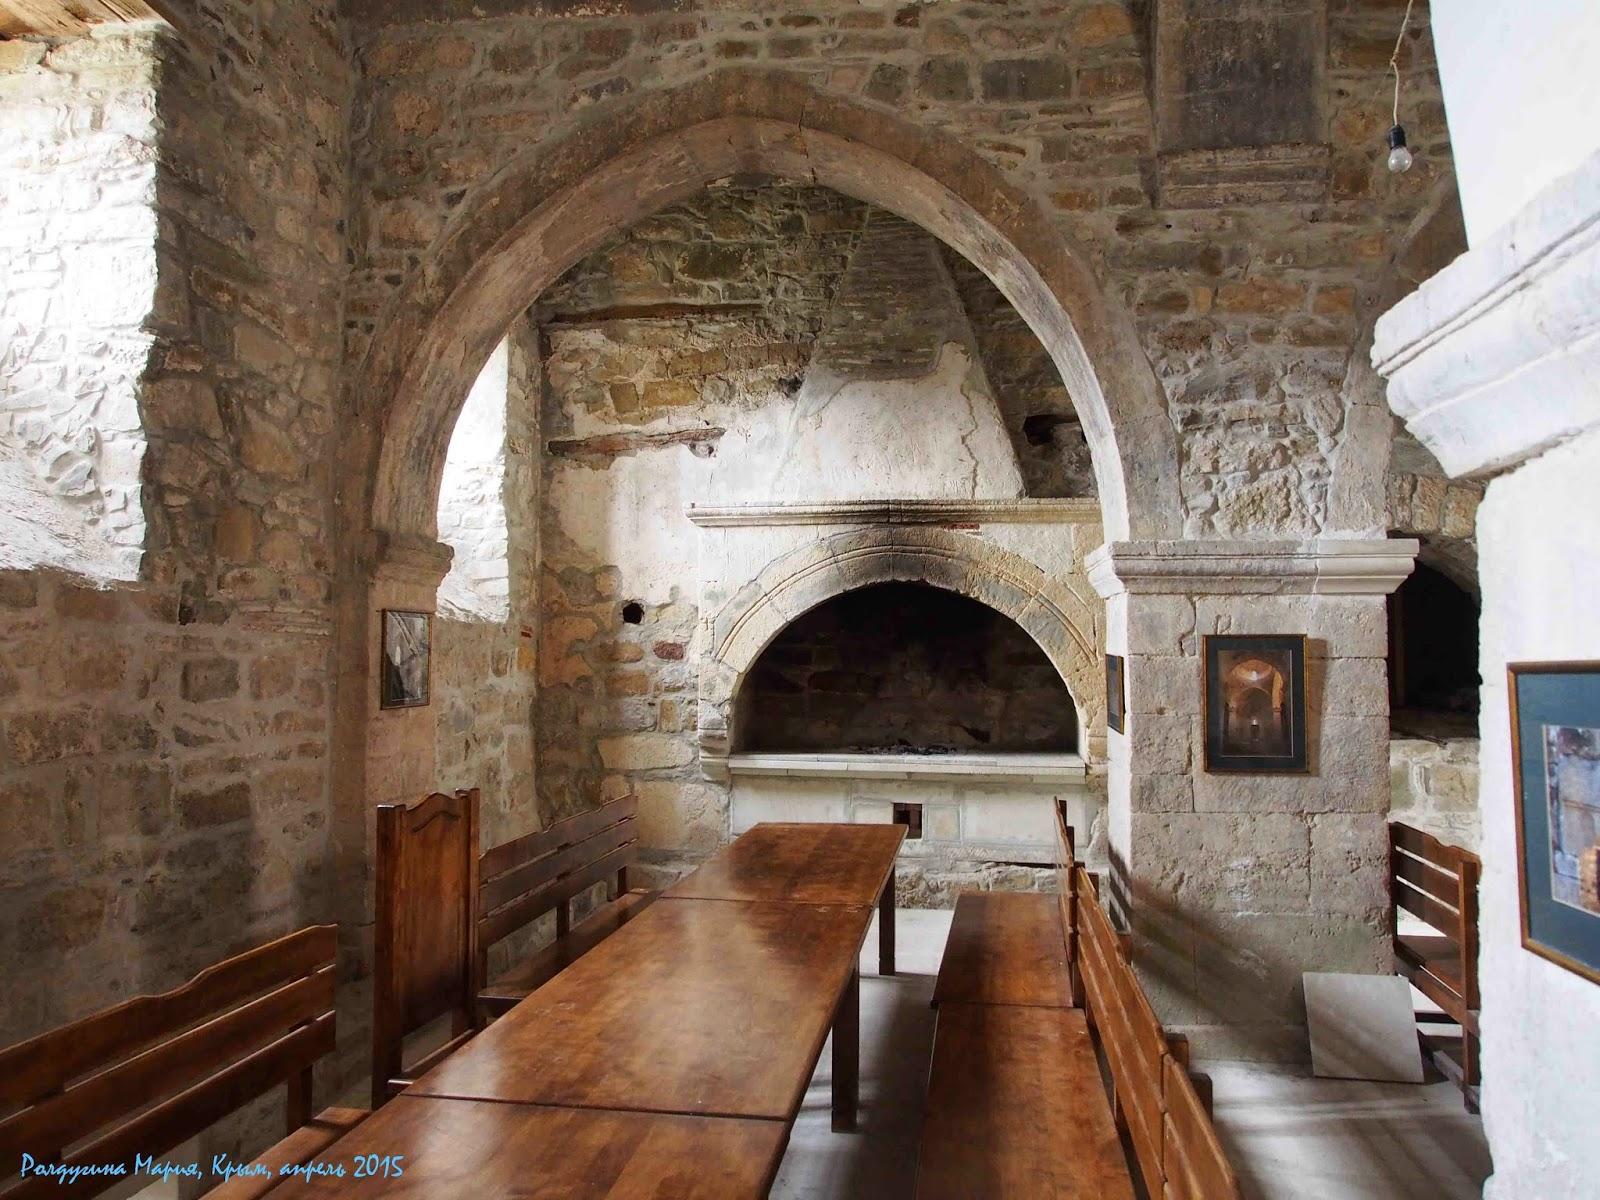 монастырь Старый Крым 2015 фото